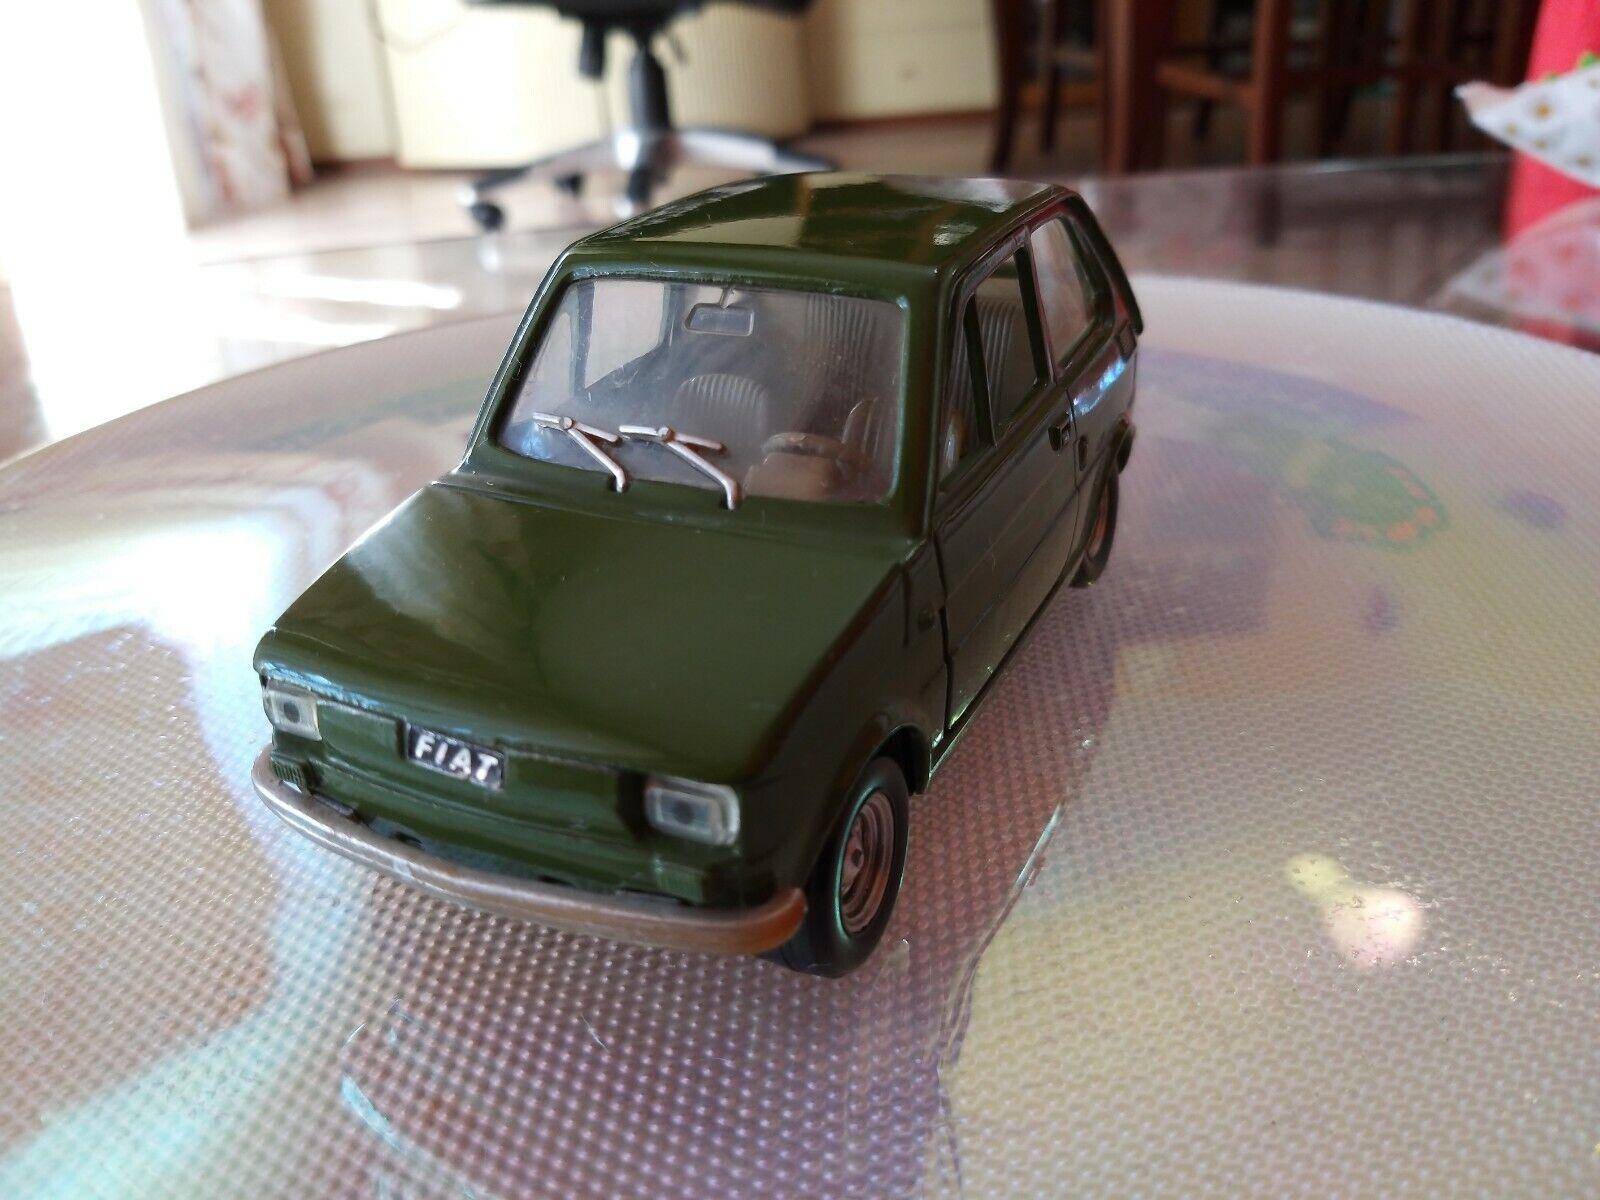 Rarissimo Modellino verde Fiat 126 POLITOYS S.17 MADE IN ITALY apertura 4 porte